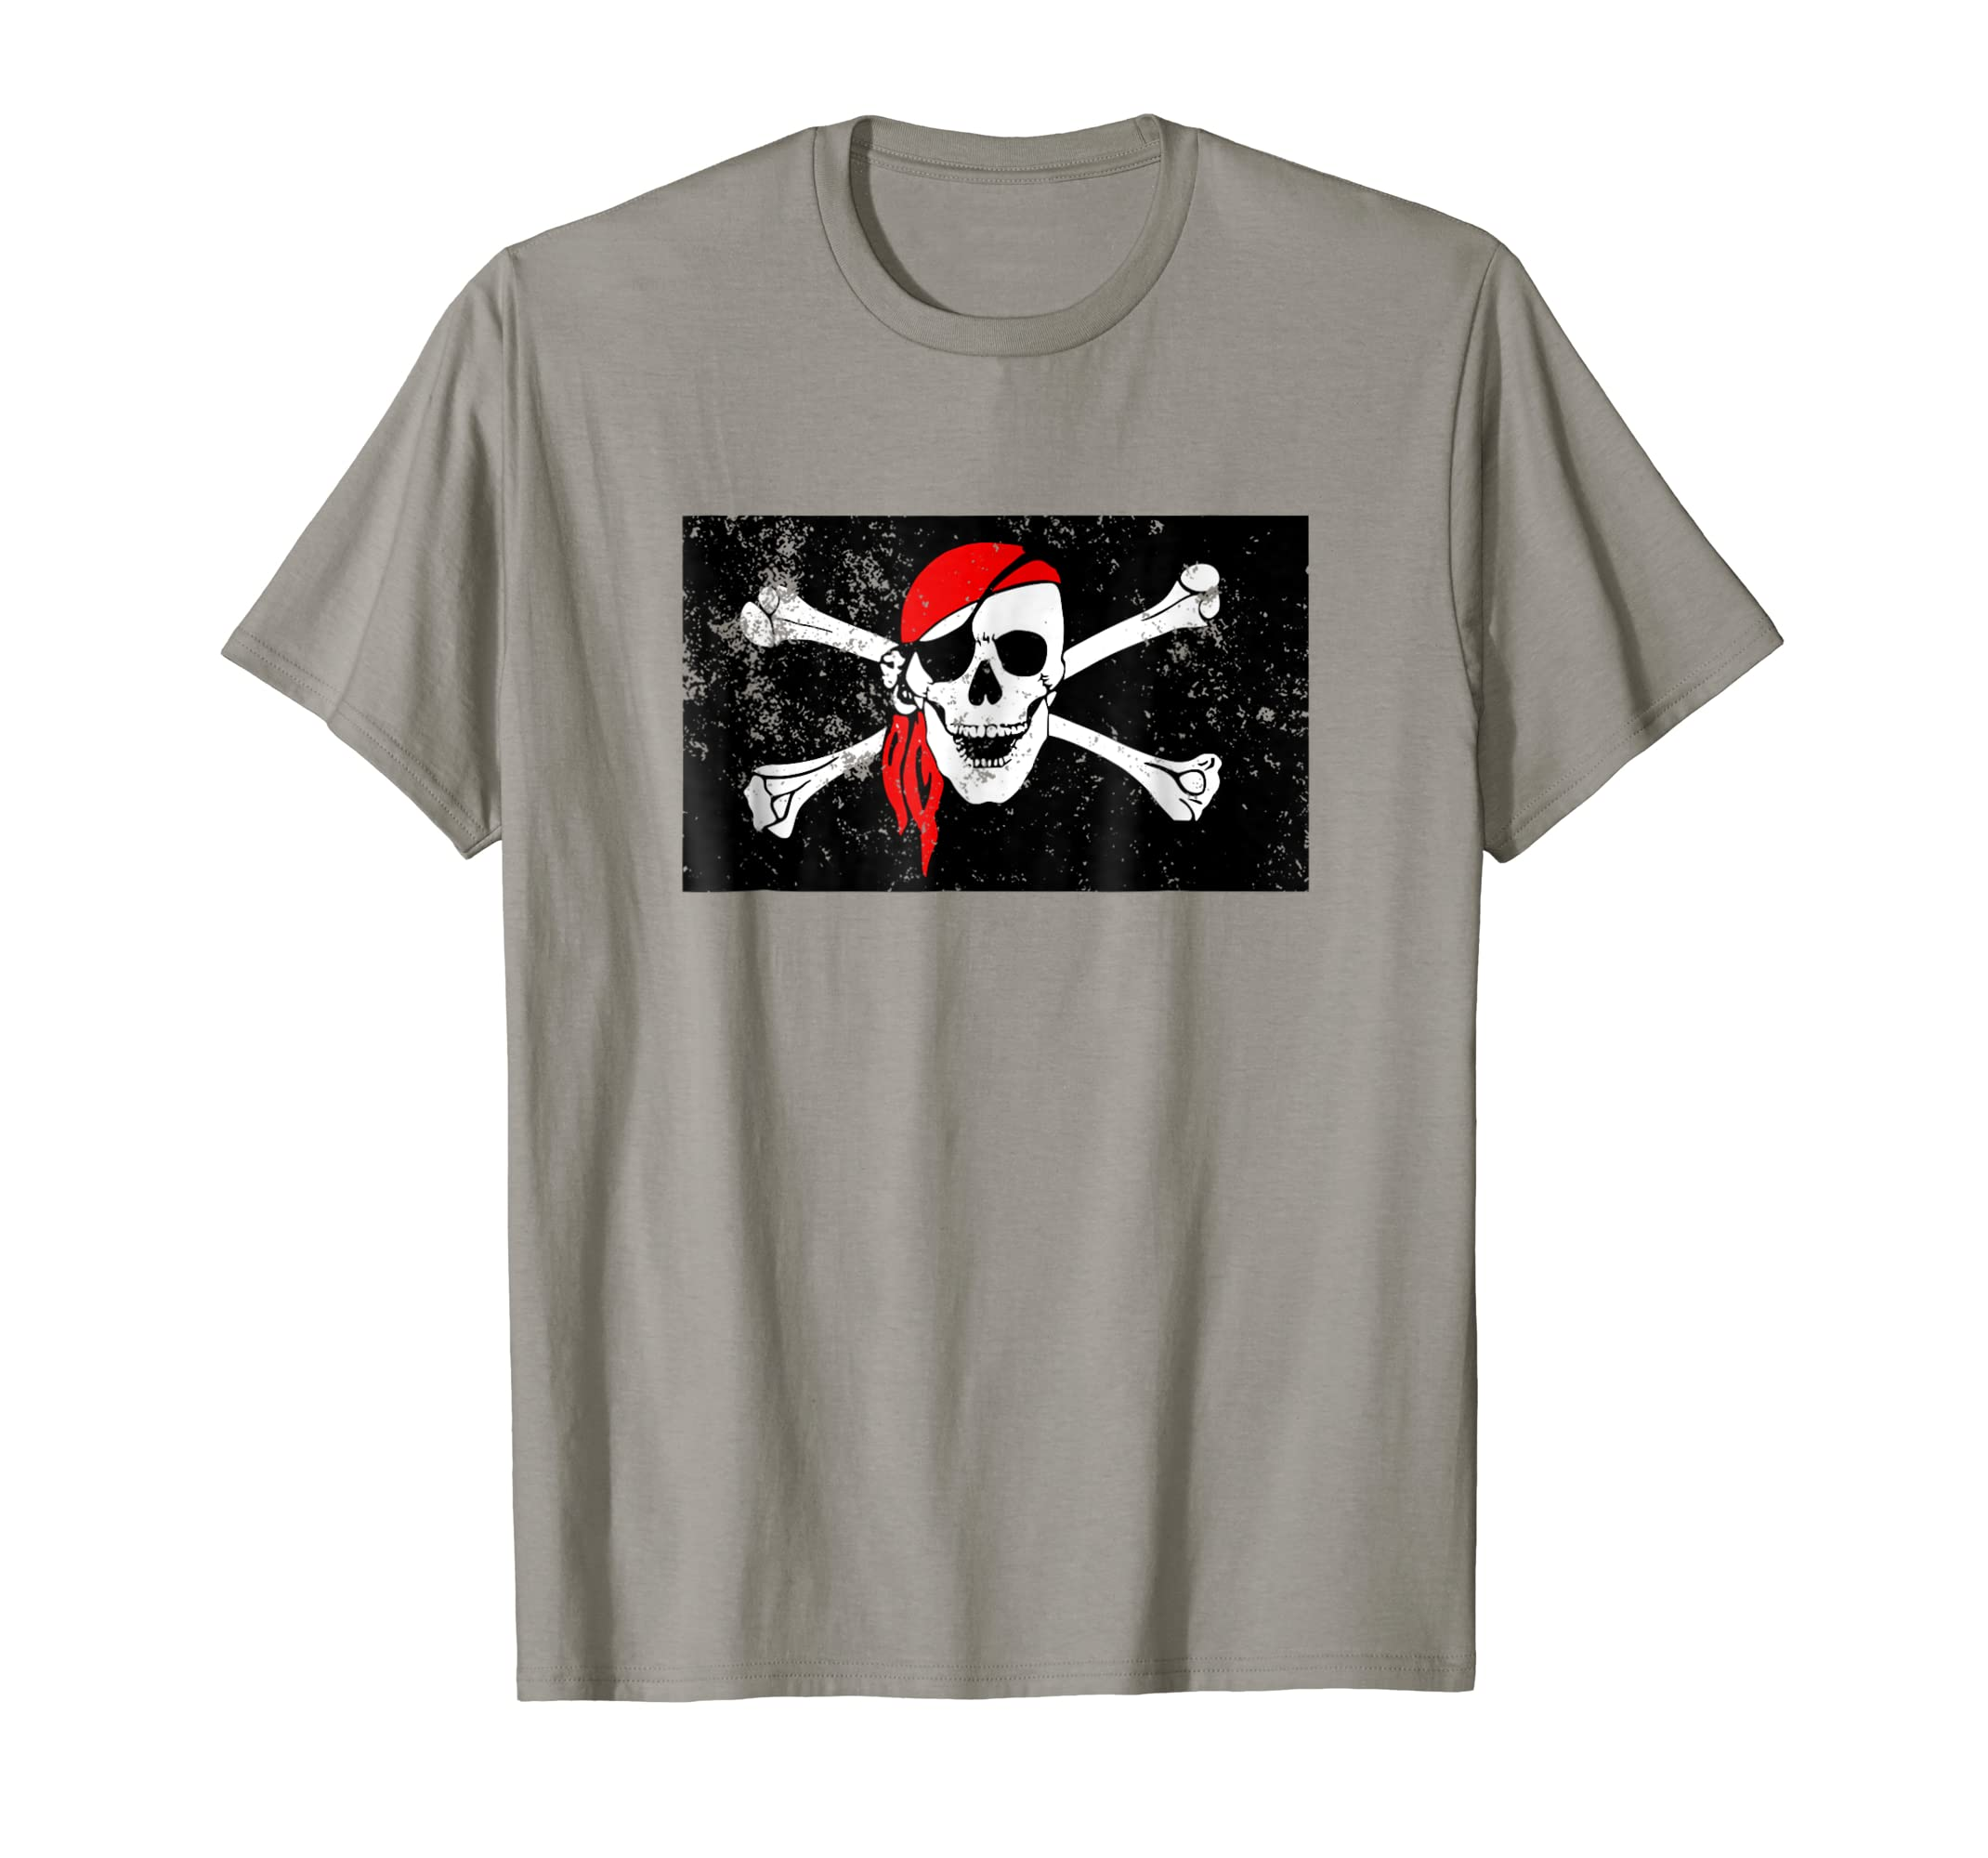 Spooky Pirate Skull and Crossbones T-shirt Halloween-mt